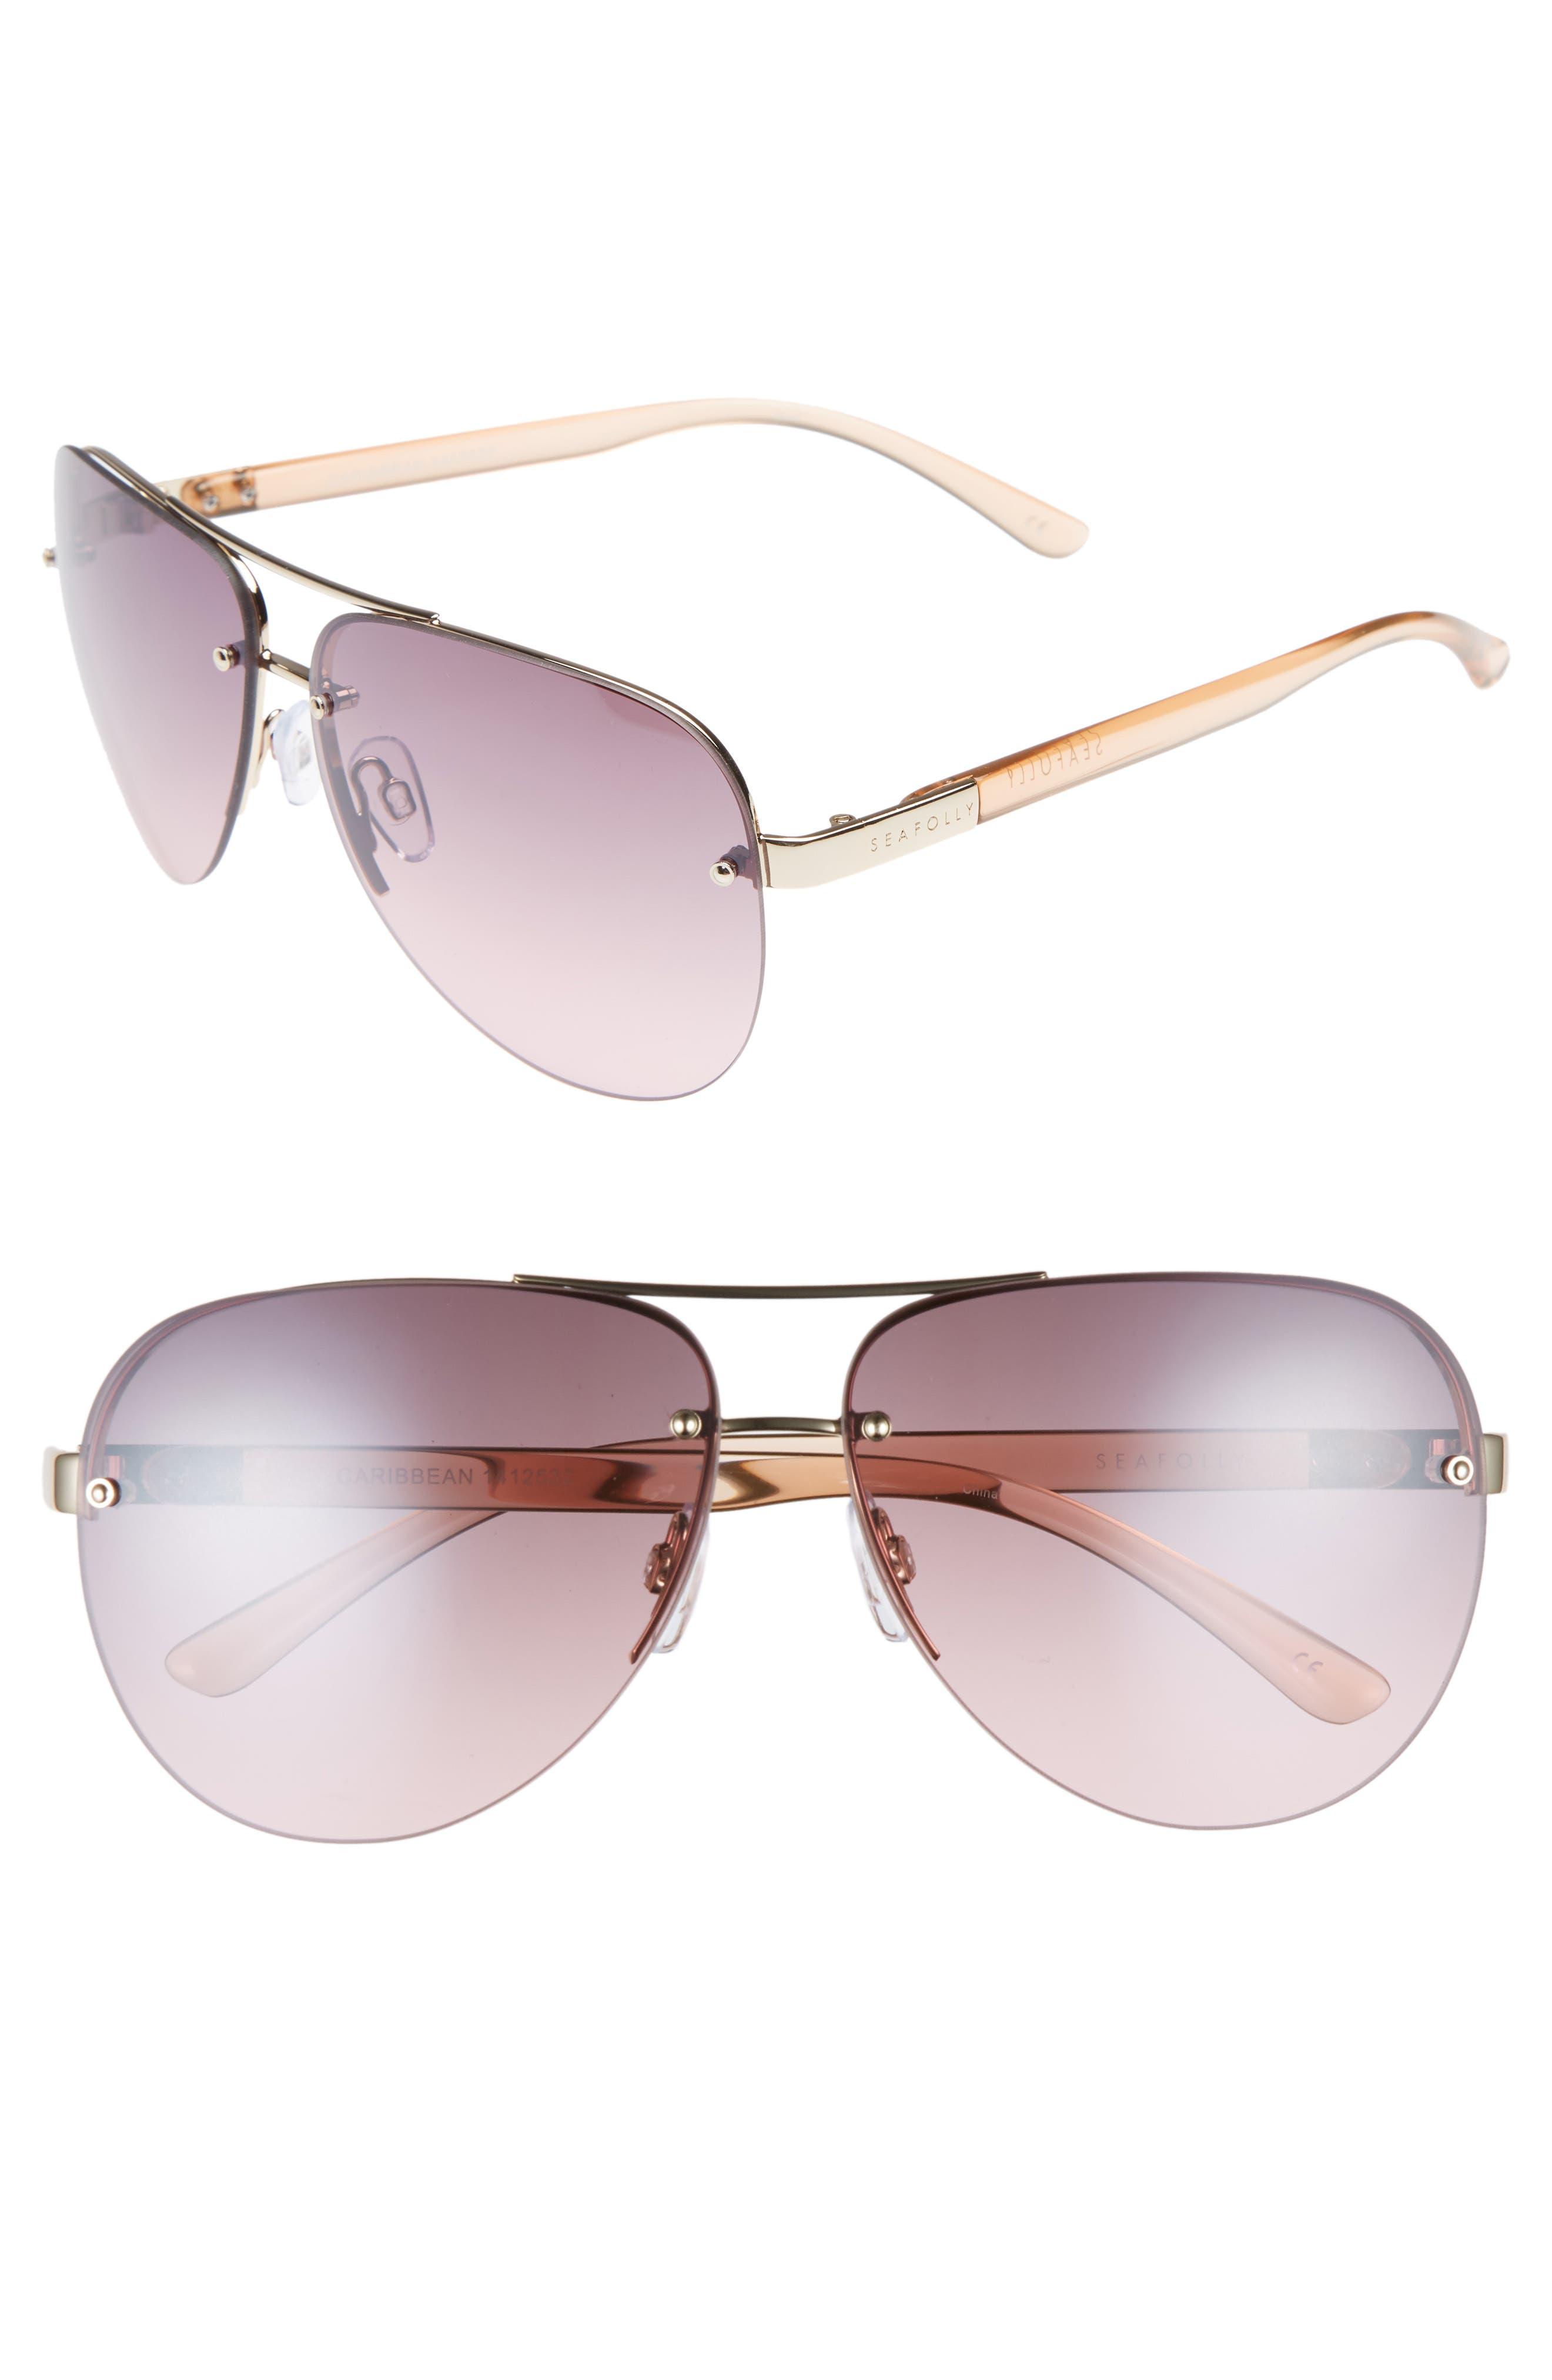 Caribbean 62mm Rimless Aviator Sunglasses,                         Main,                         color, Gold